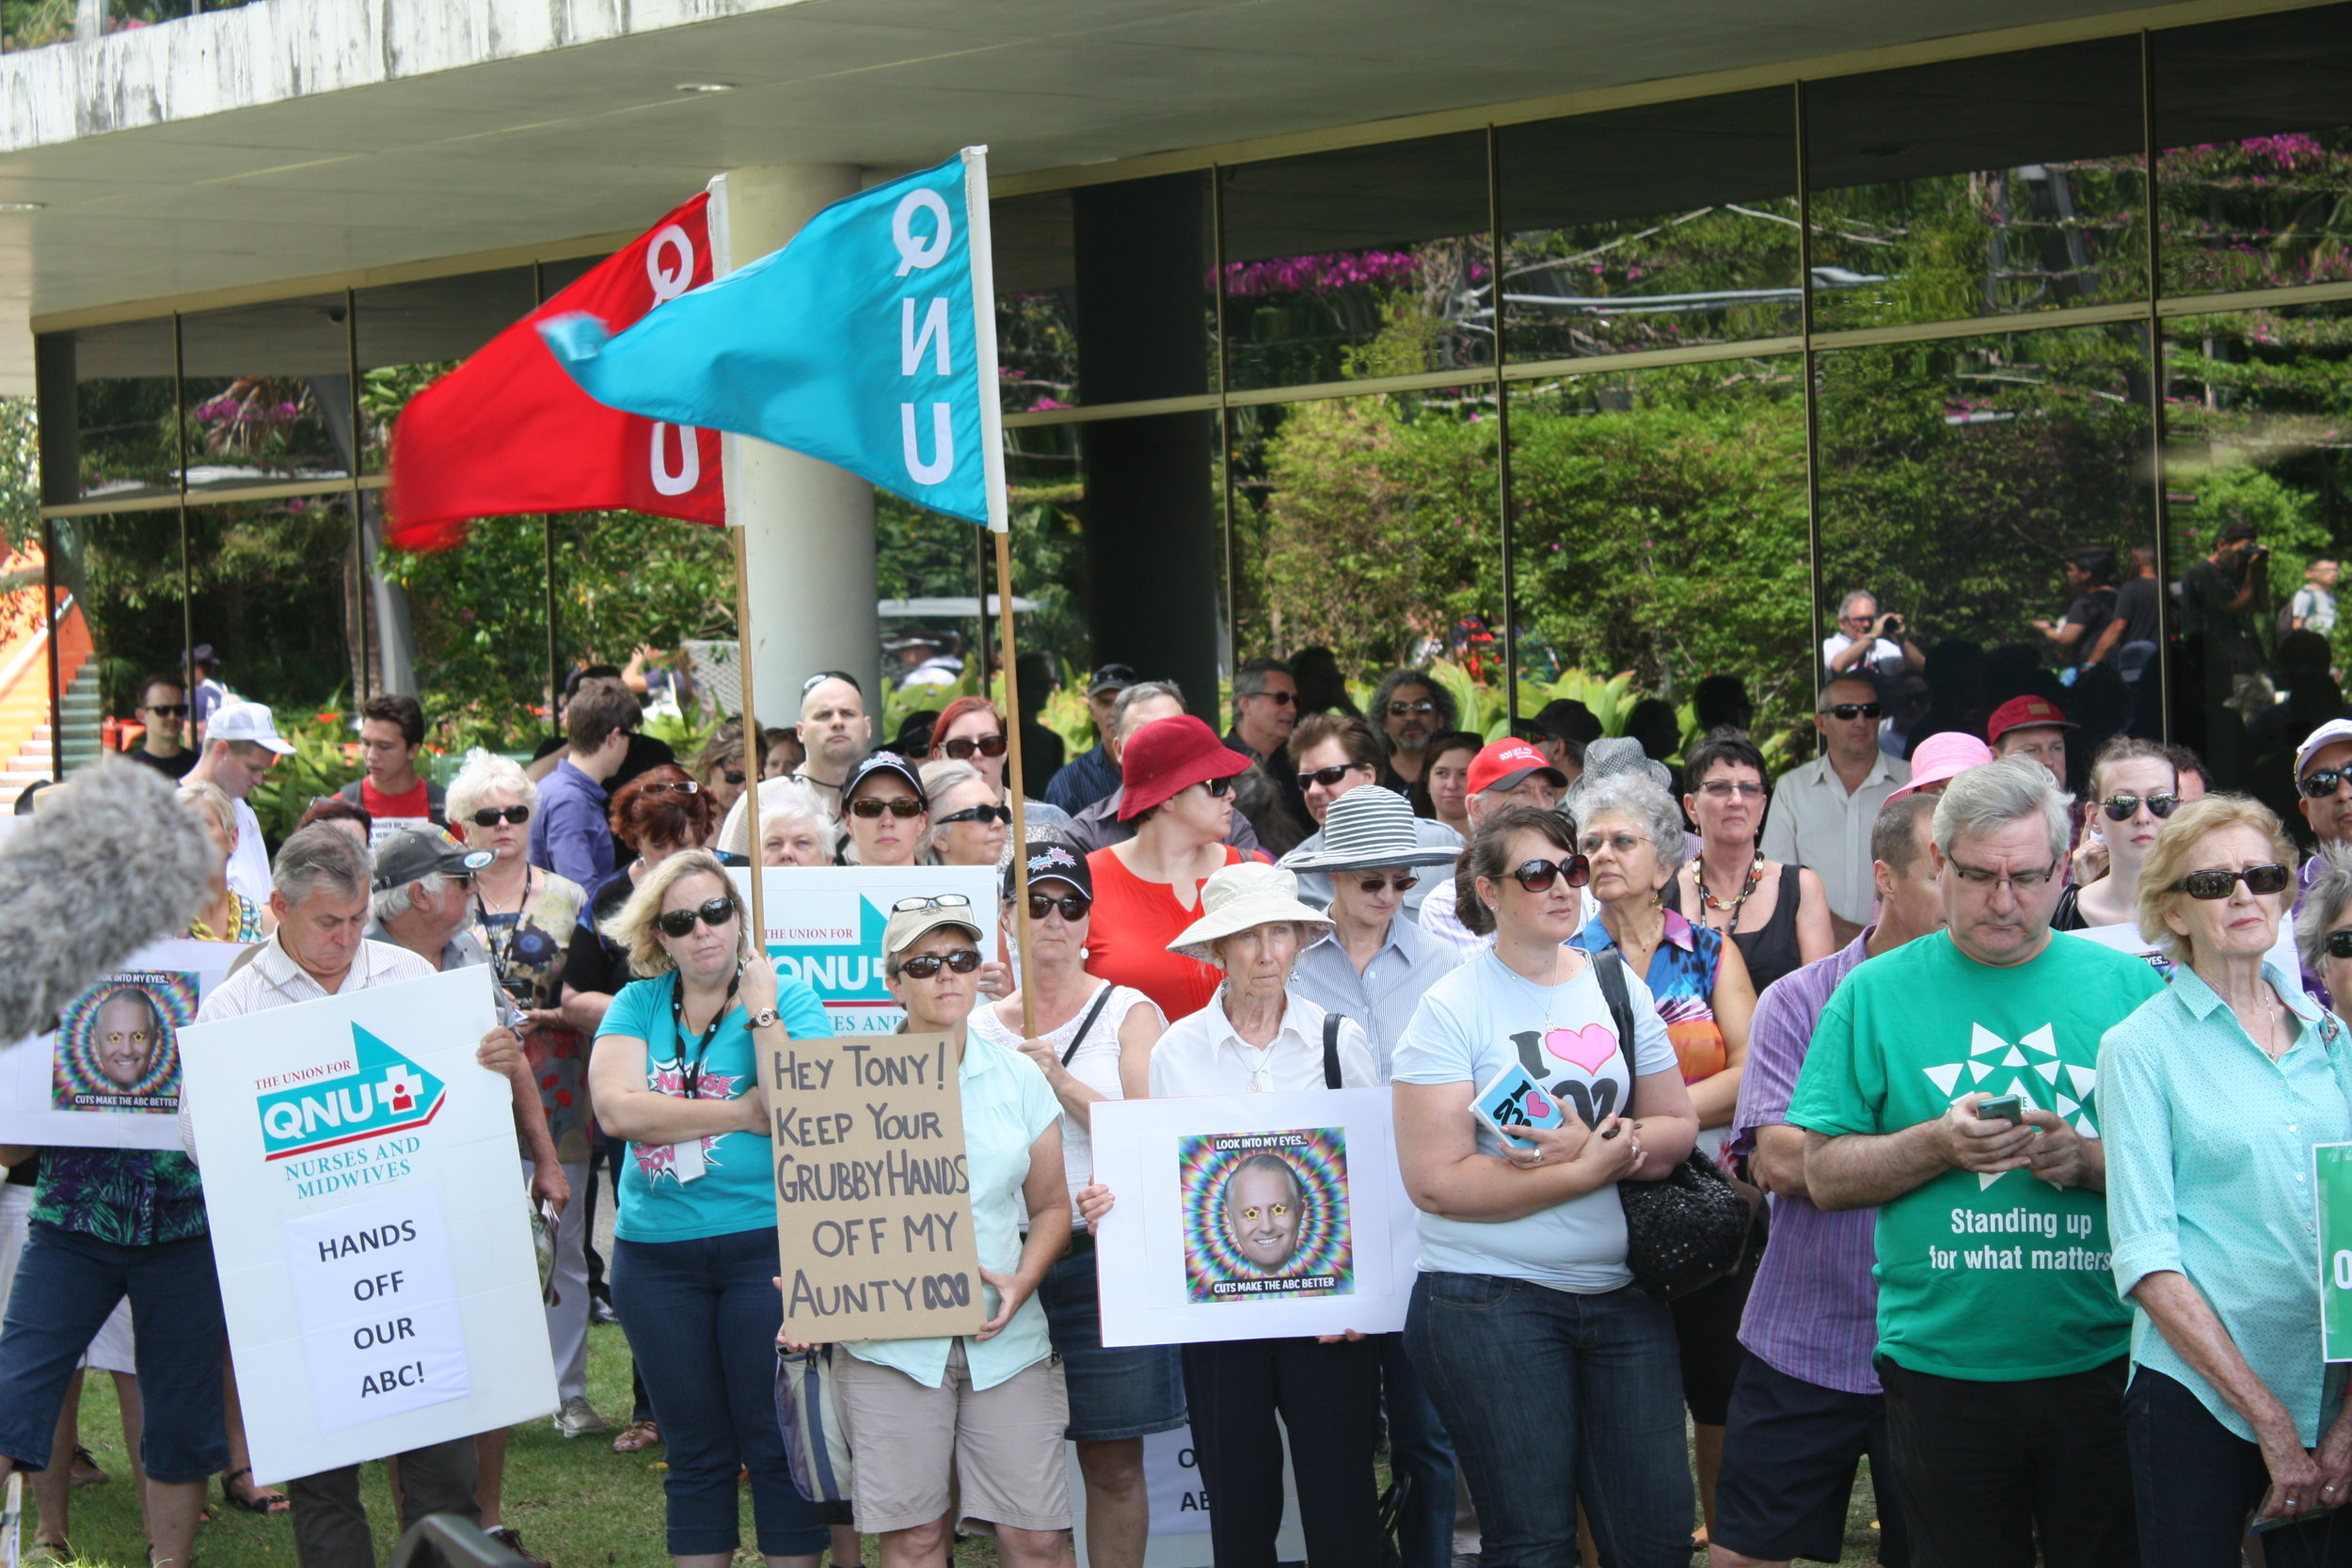 Lesly Lotha_Newzulu Australia_ABC cuts protest_Brisbane 07